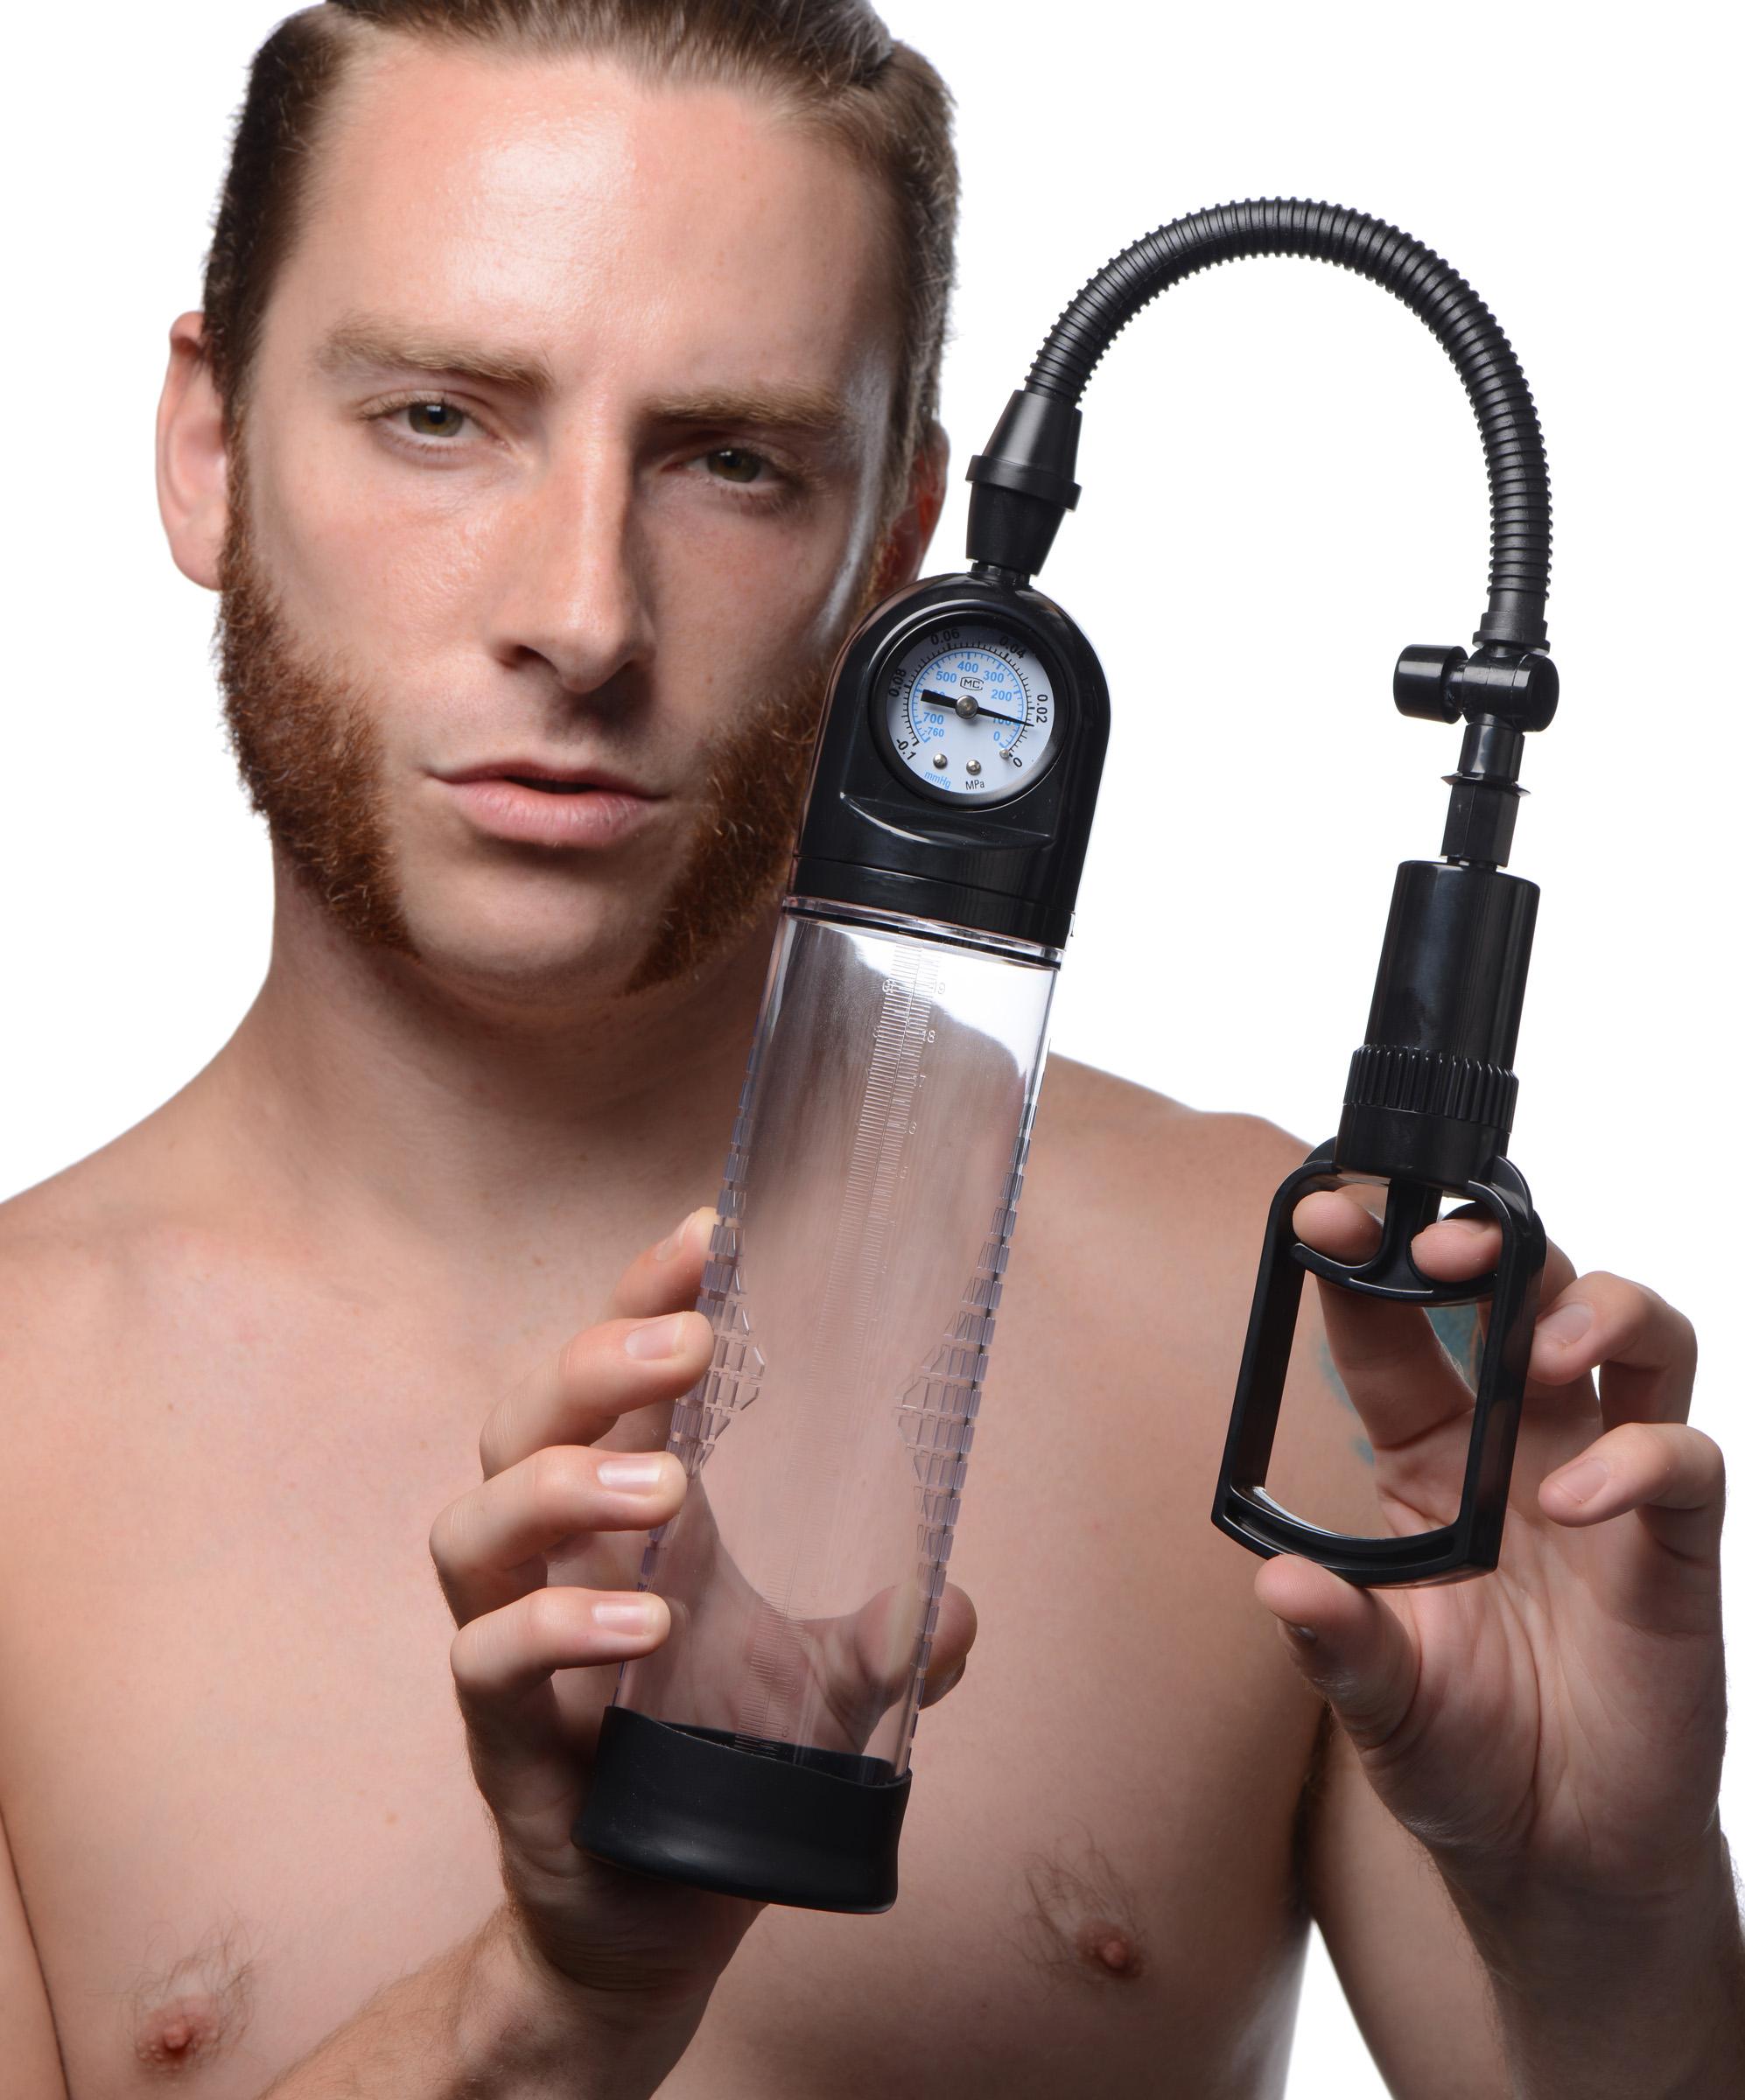 The penis pump